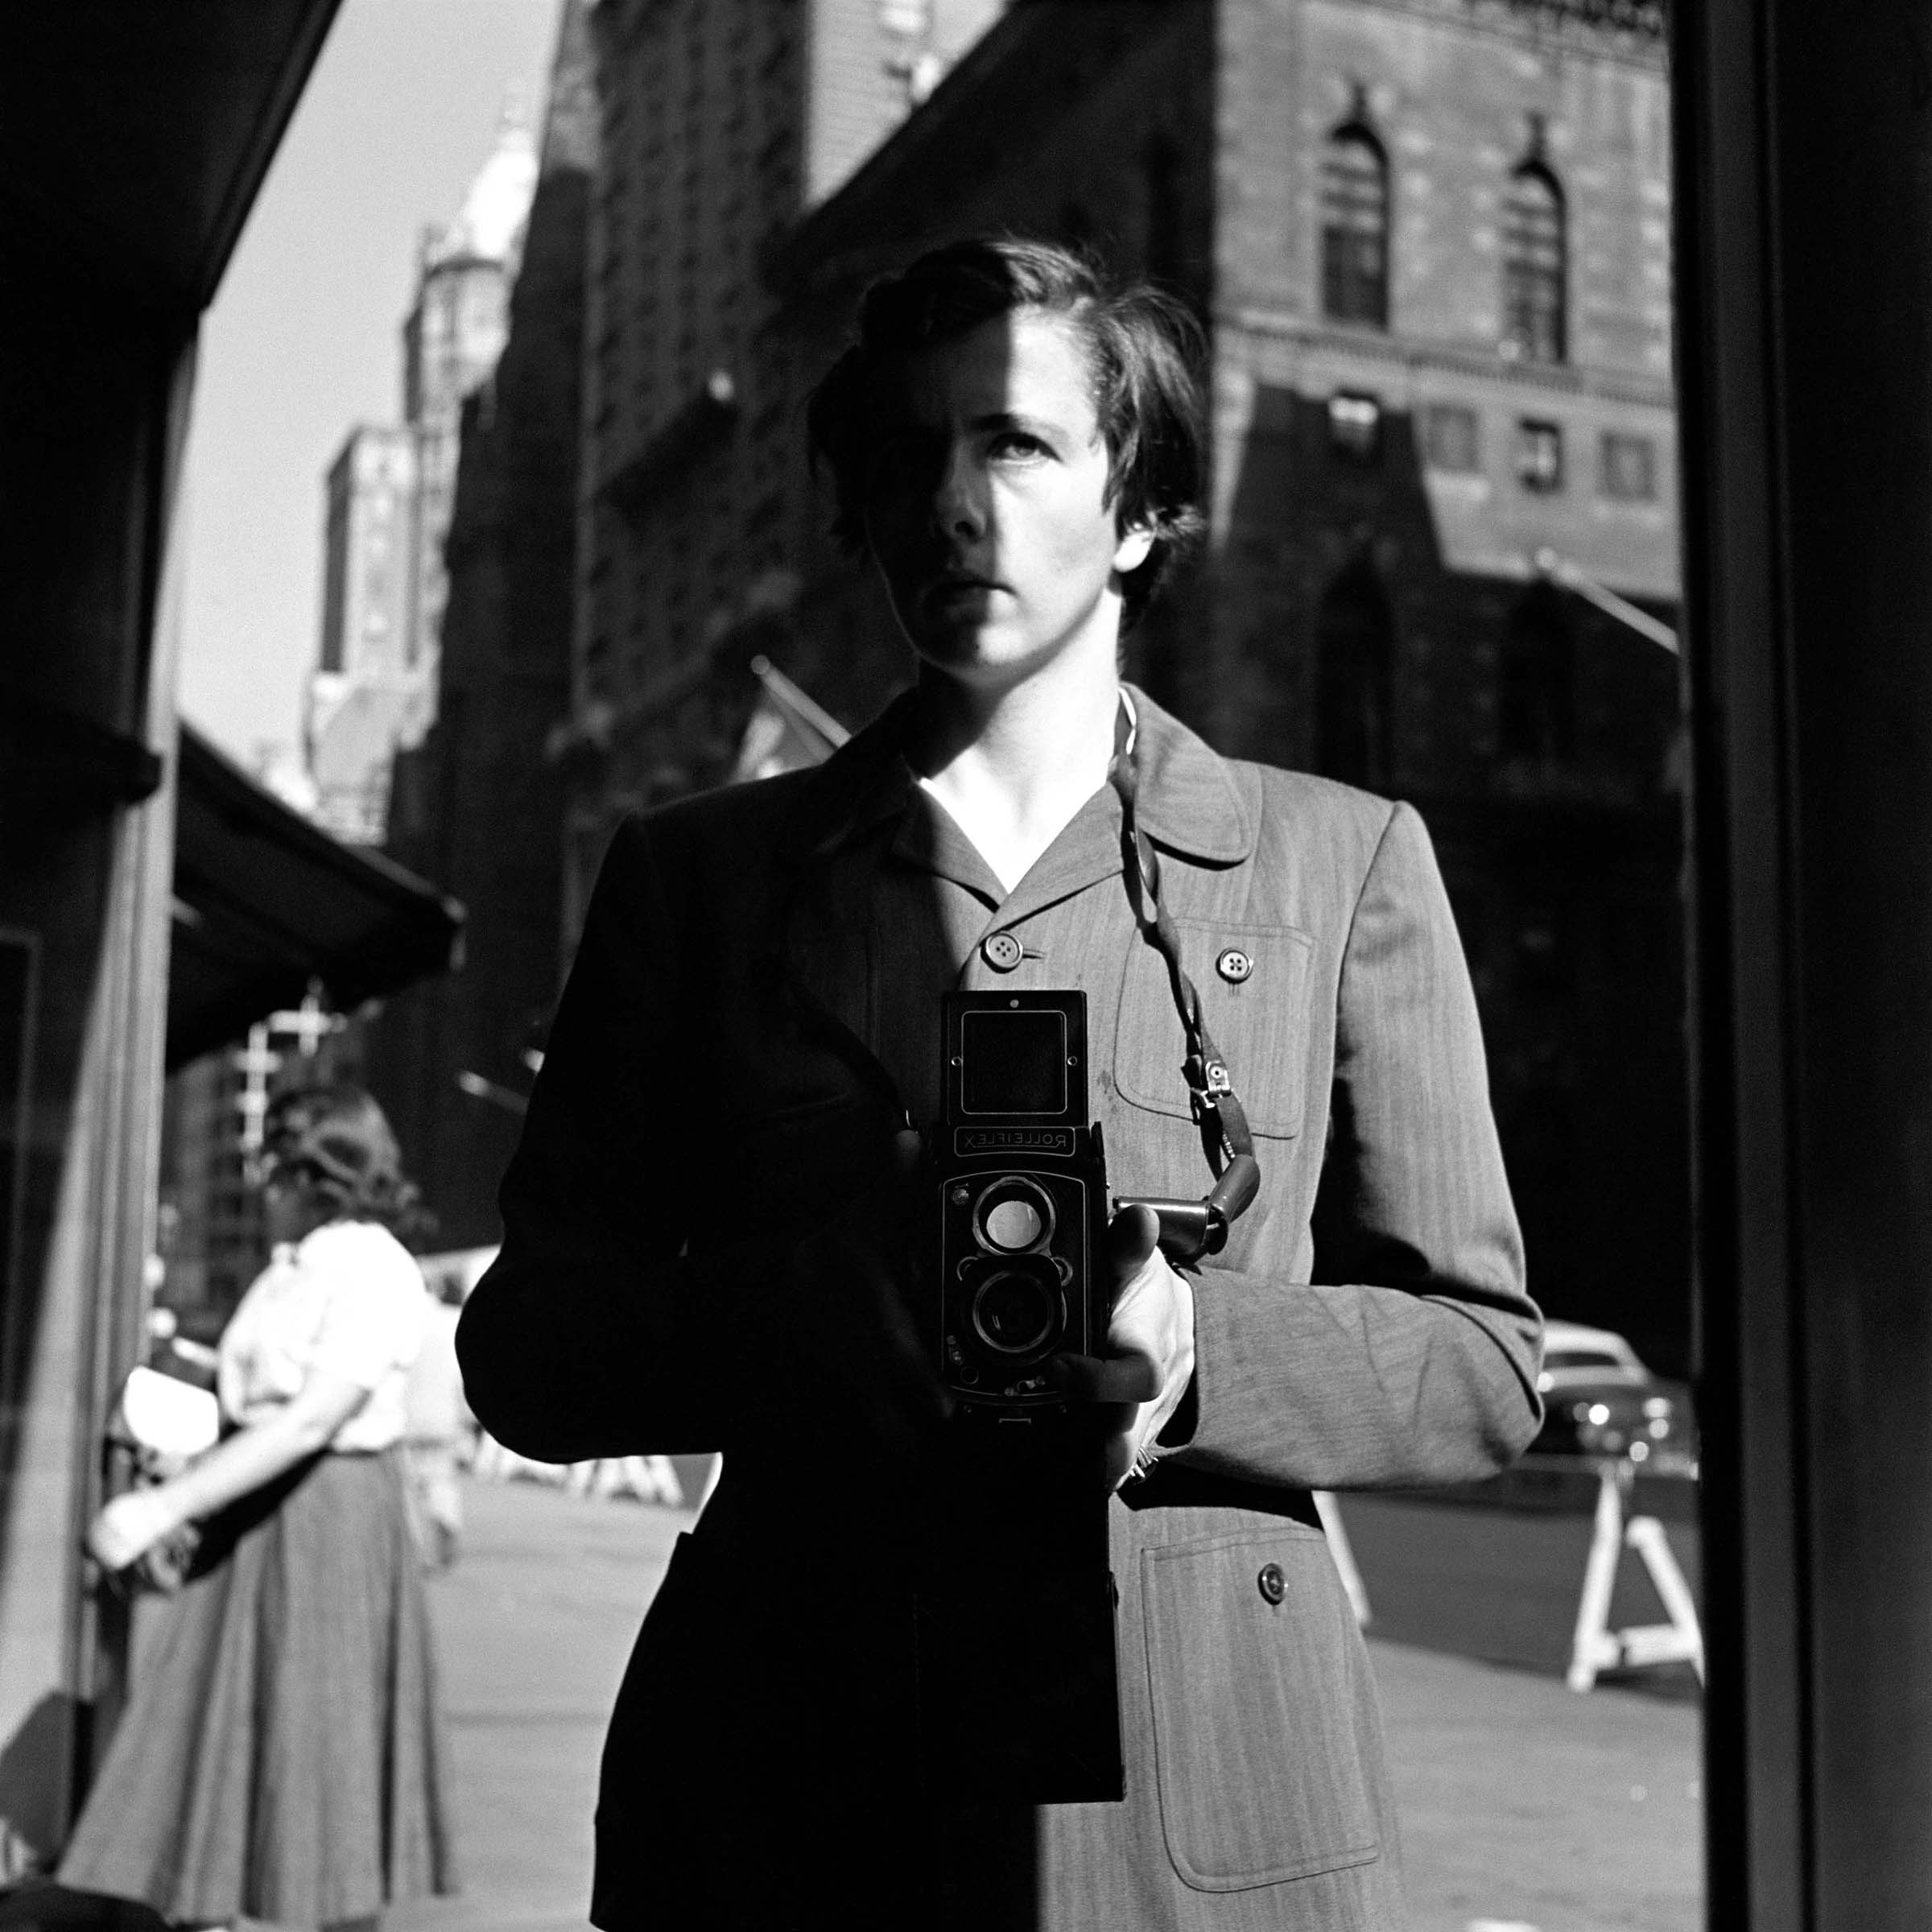 Vivian Maier, the secret photographer